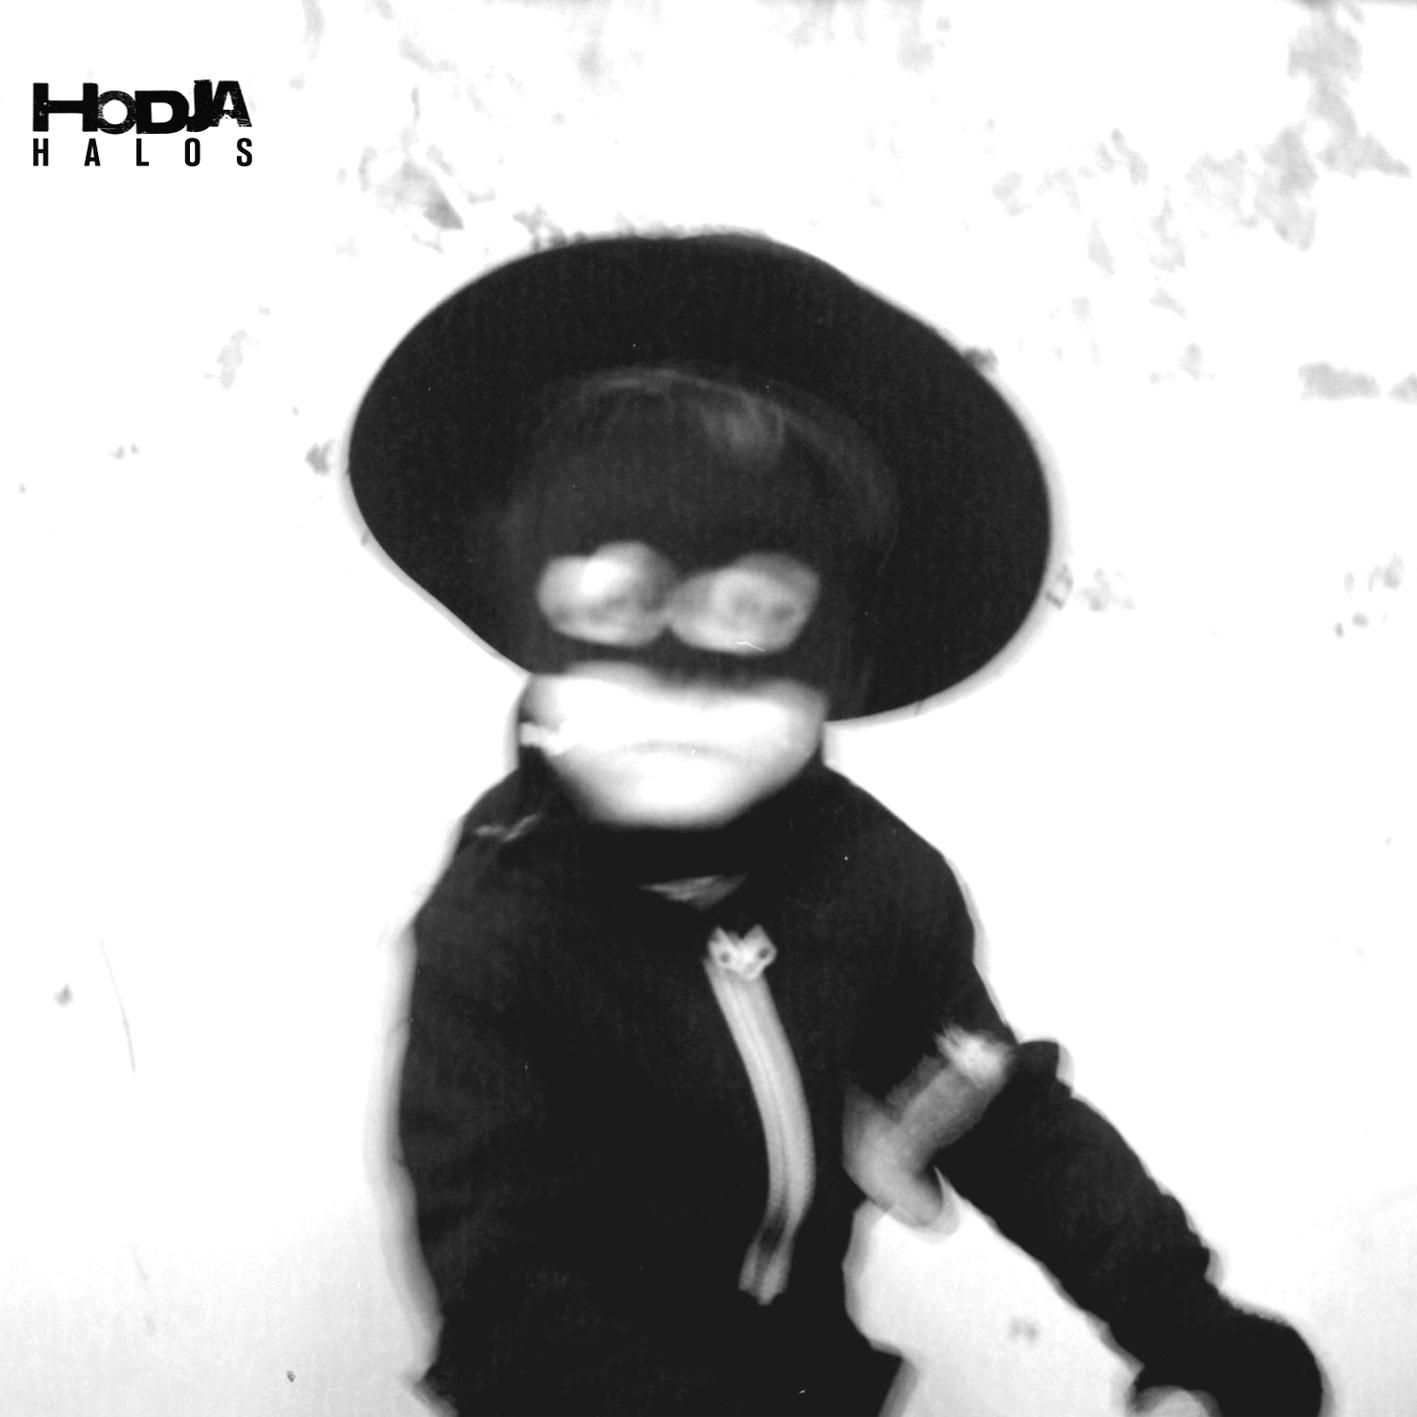 HODJA - Halos, Cover, Noisolution 2016